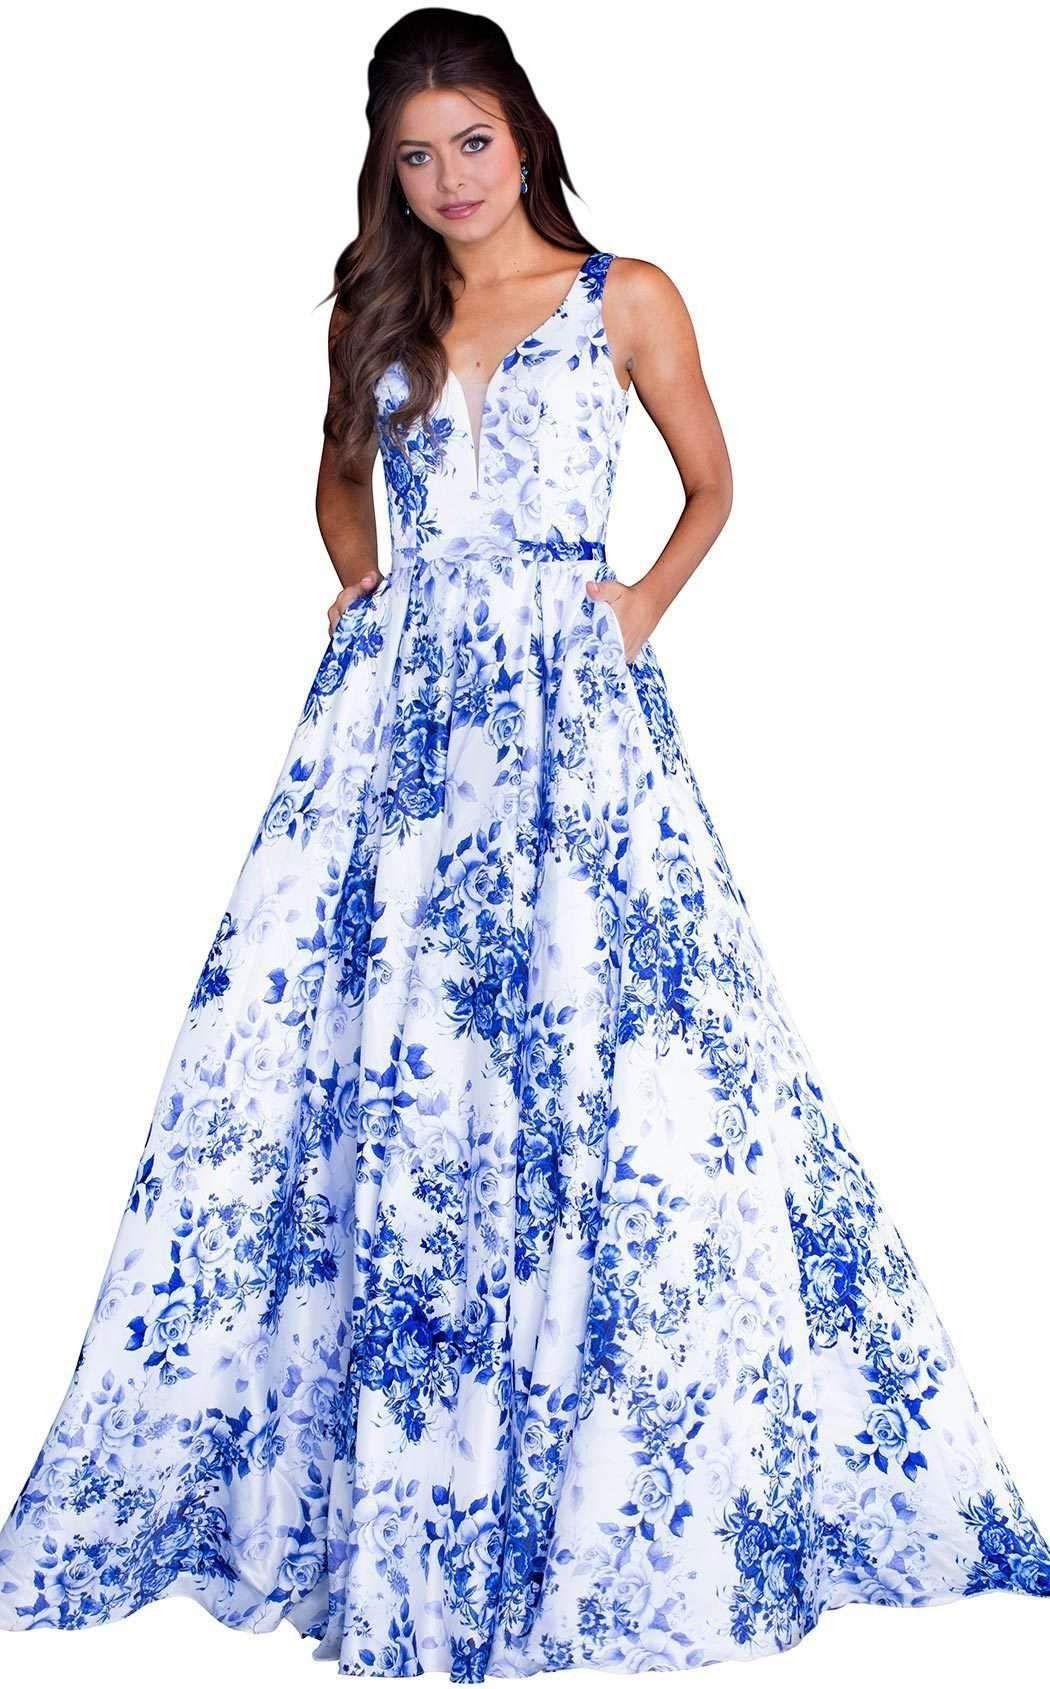 17d16ad5ccc7 JVN 60561 Curvy Fit, Hemline, Evening Gowns, Fabric, Formal Dresses, A